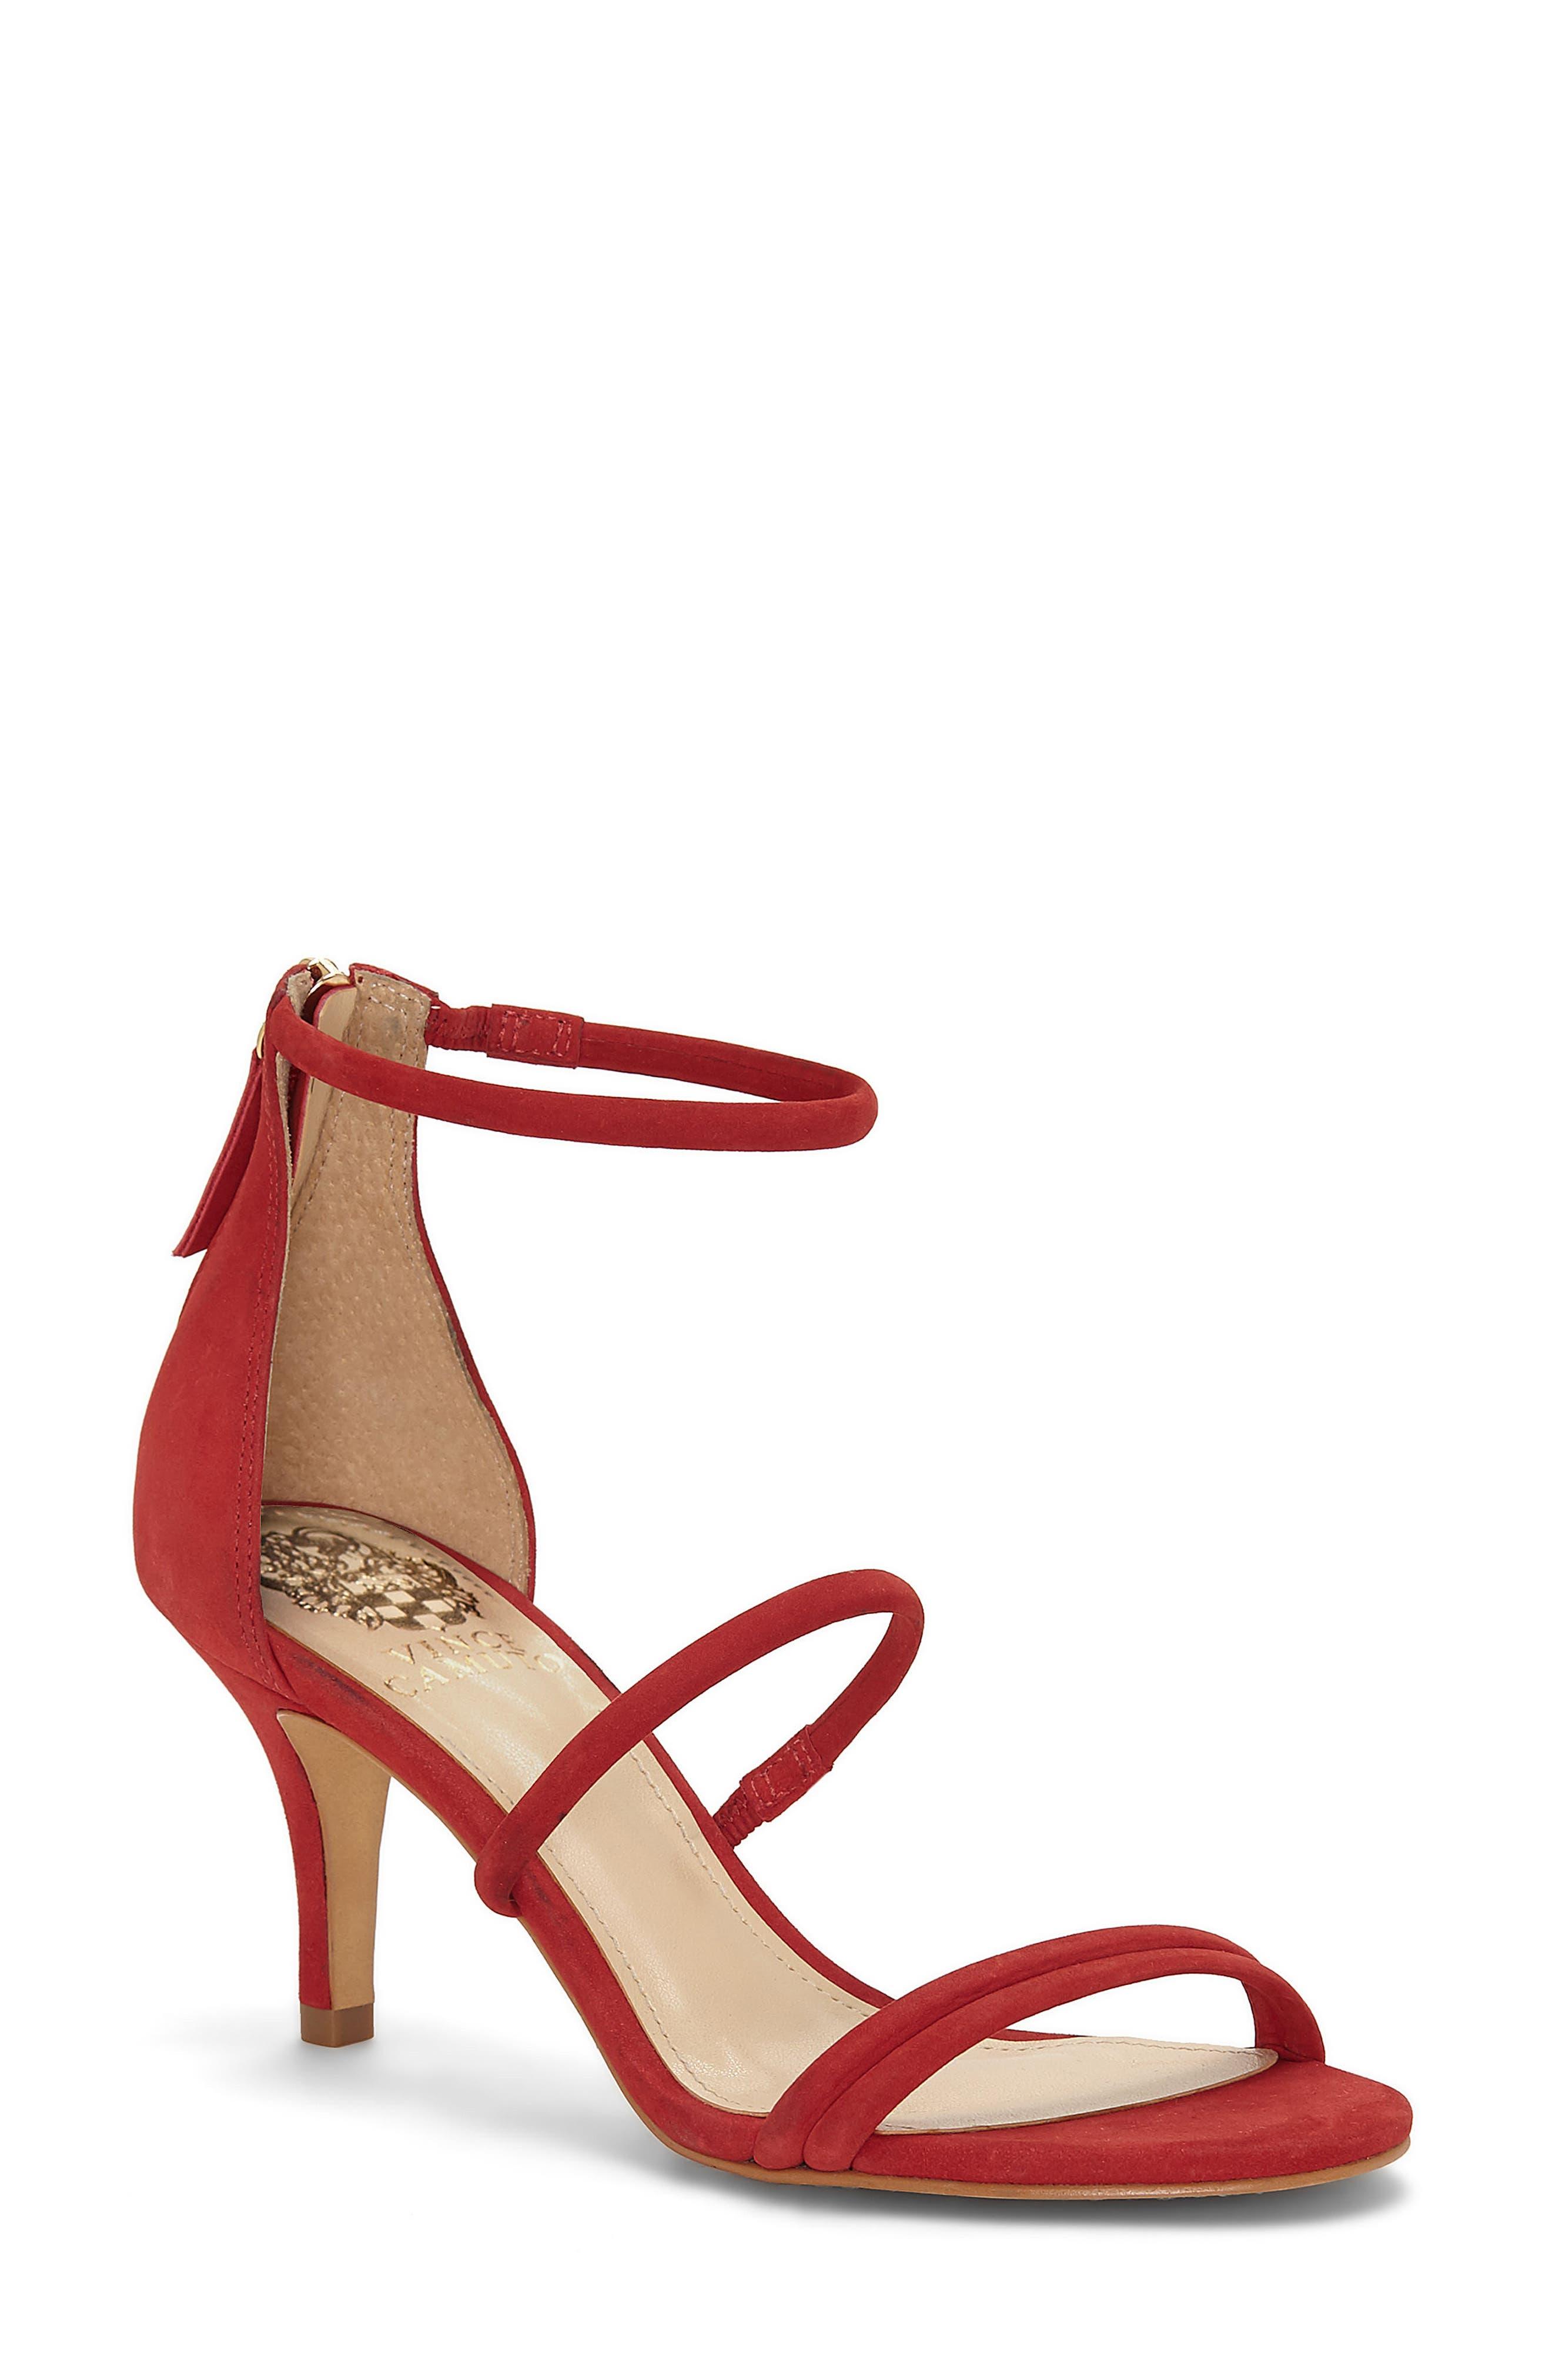 Aviran Sandal,                         Main,                         color, Ruby Red Nubuck Leather